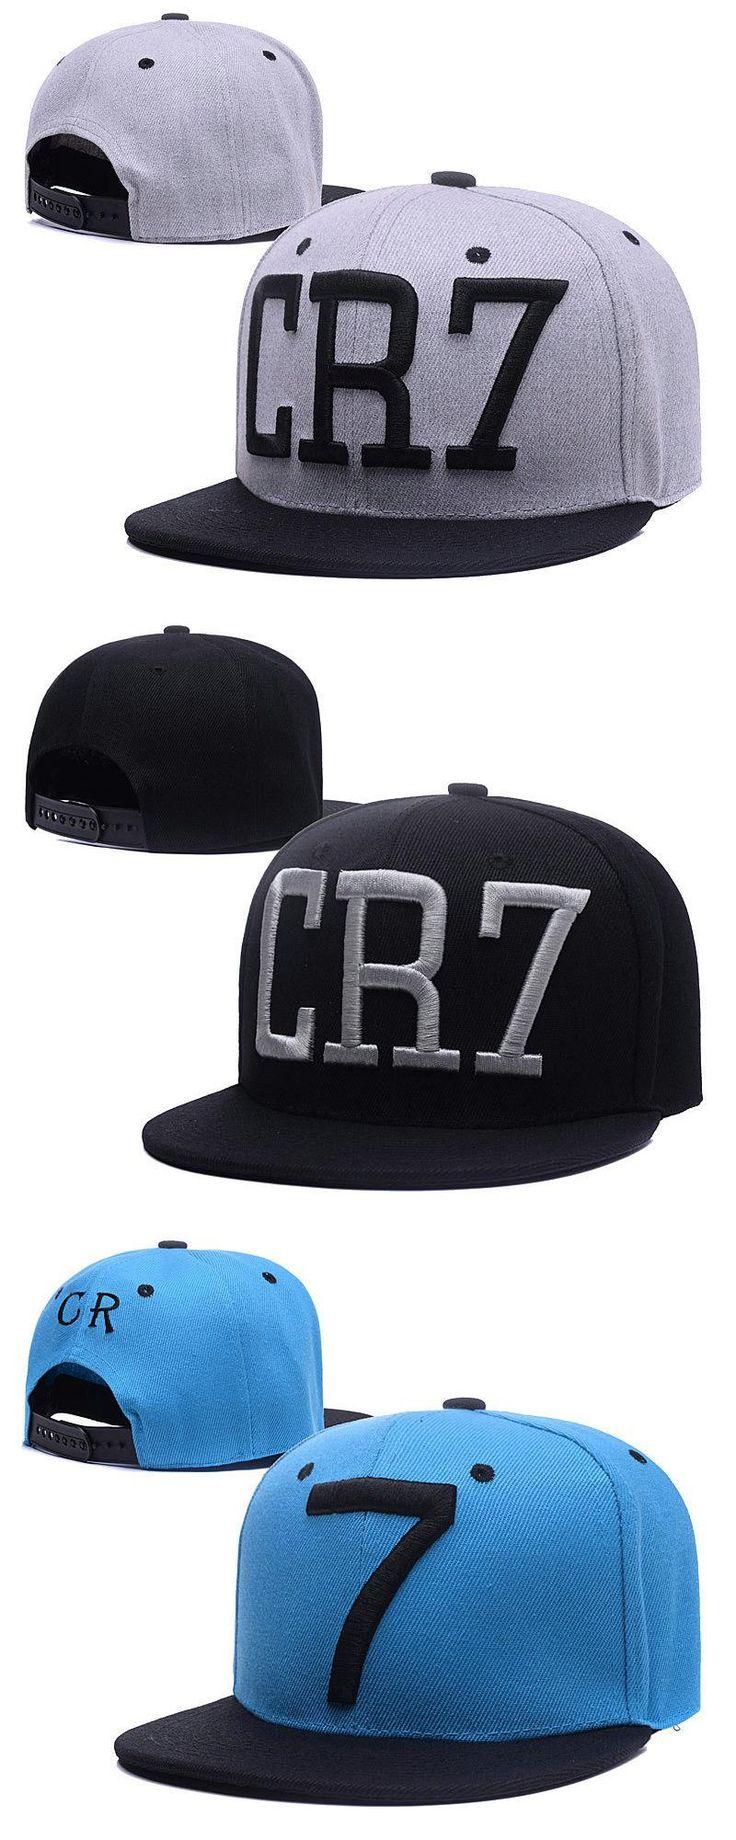 [Visit to Buy] 2016 fashion Cristiano Ronaldo CR7 Baseball Caps hip hop Sports Snapback Football hat chapeu de sol bone Men women coupie hats #Advertisement